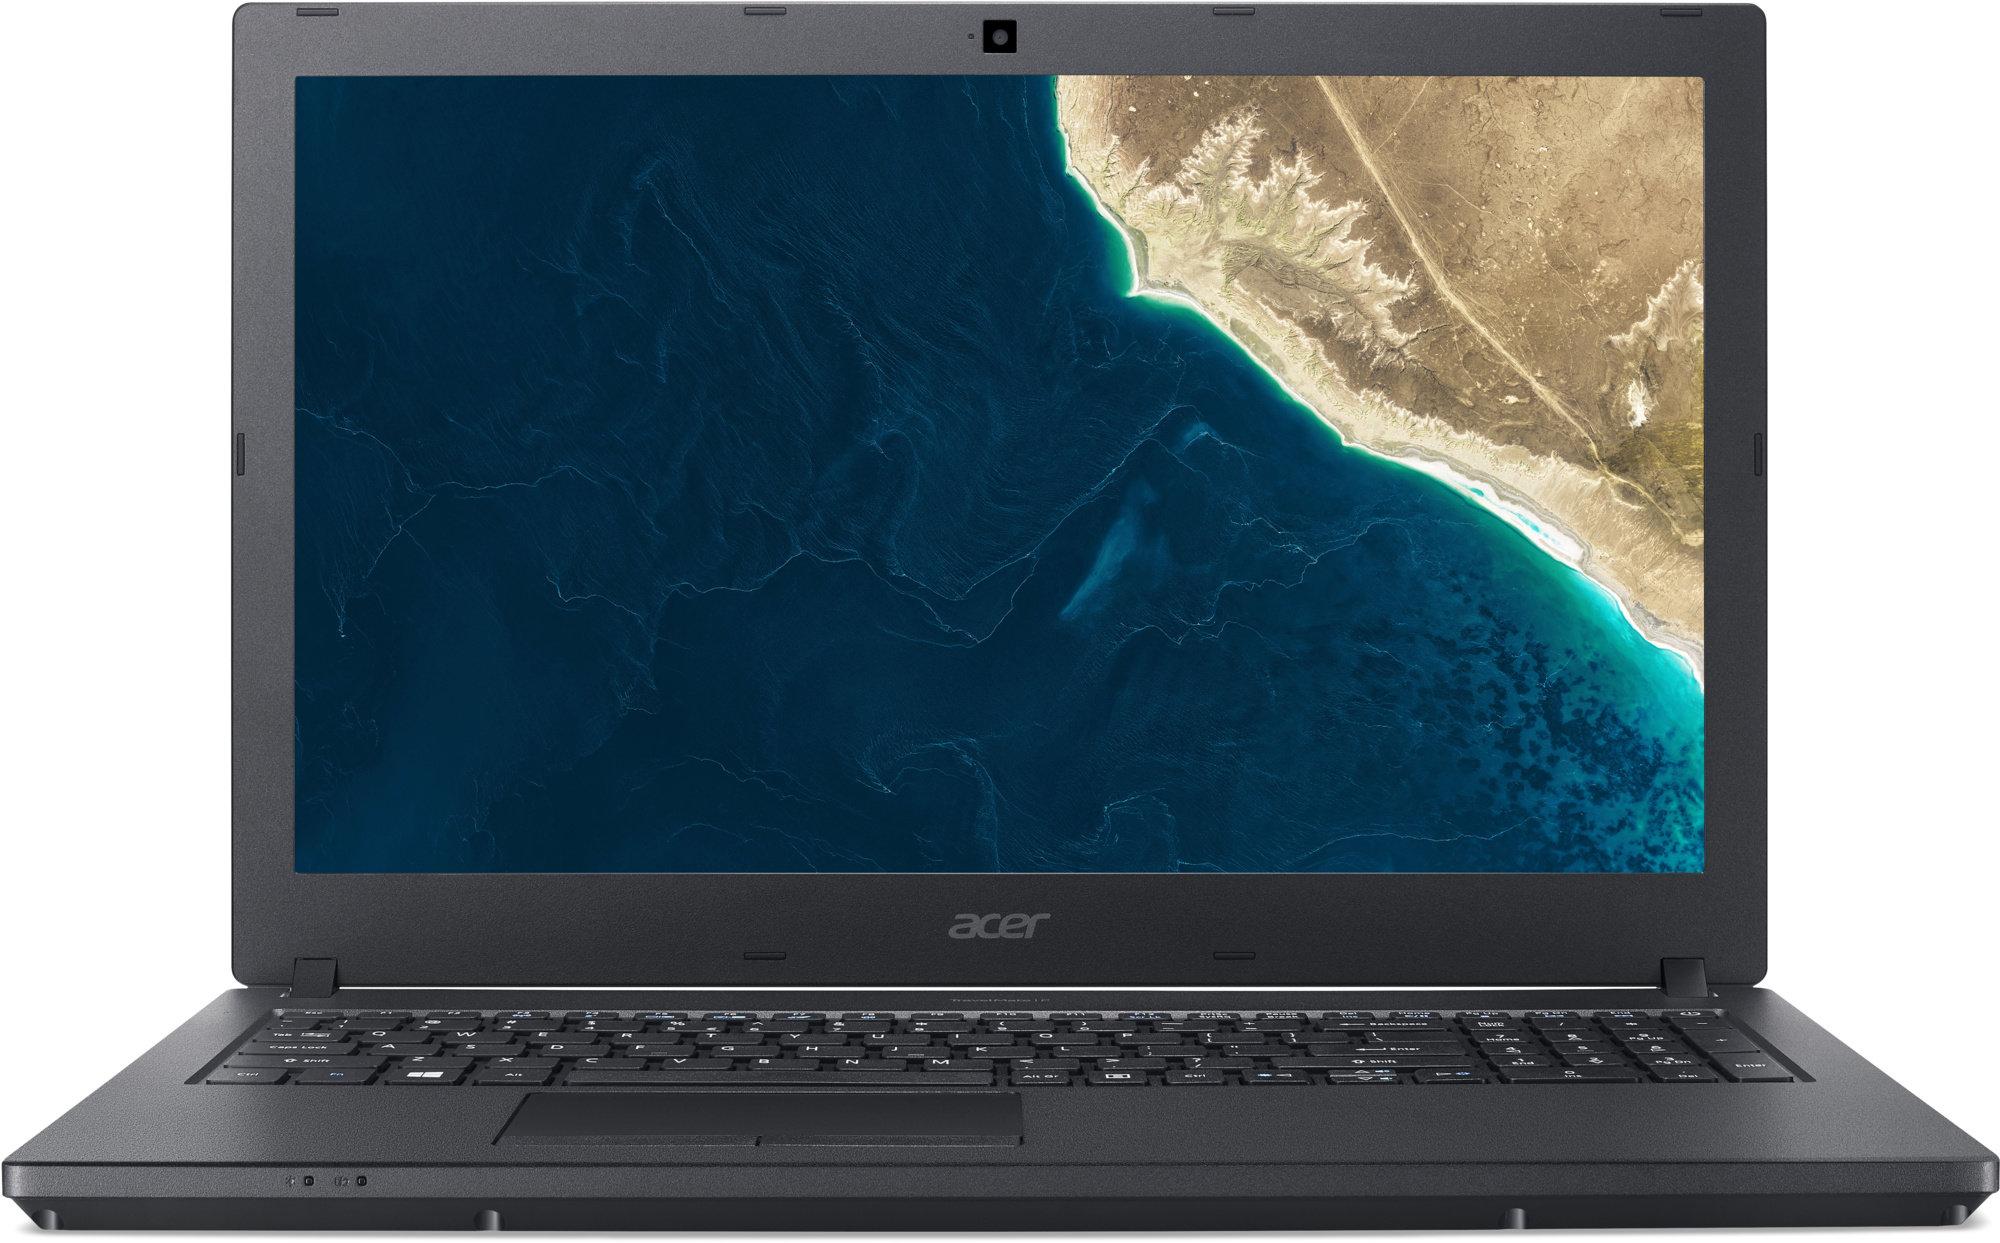 "AcerTravelMate P2510-M-38E4 i3-7130U/4GB+N/256GB SSD M.2+N/HD Graphics/15.6"" FHD LED matný/BT/W10 Pro/Black"